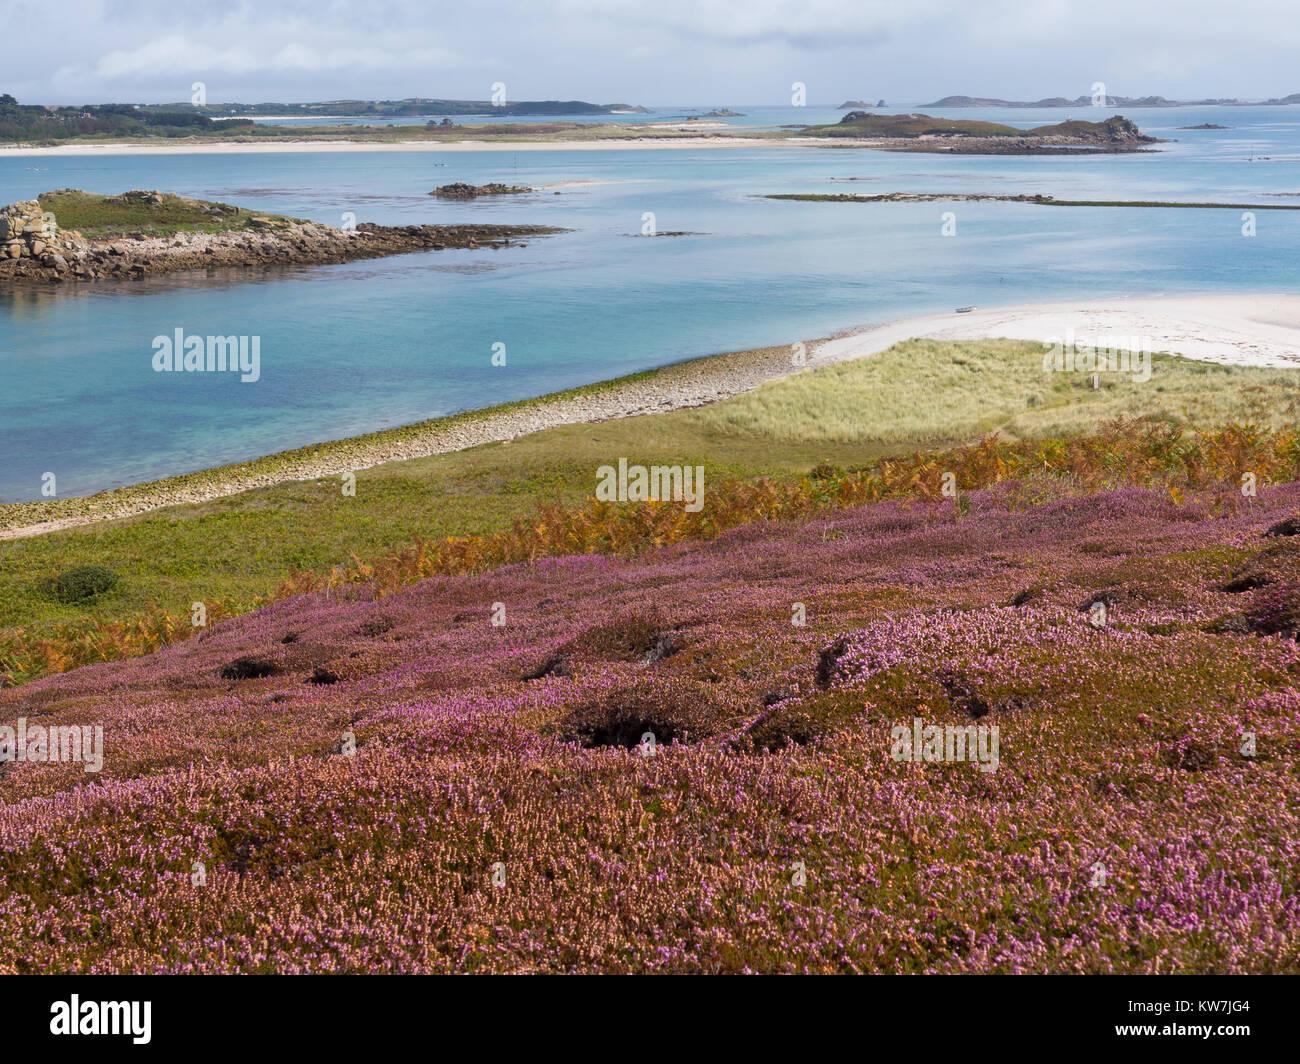 River estuary running into the ocean - Stock Image